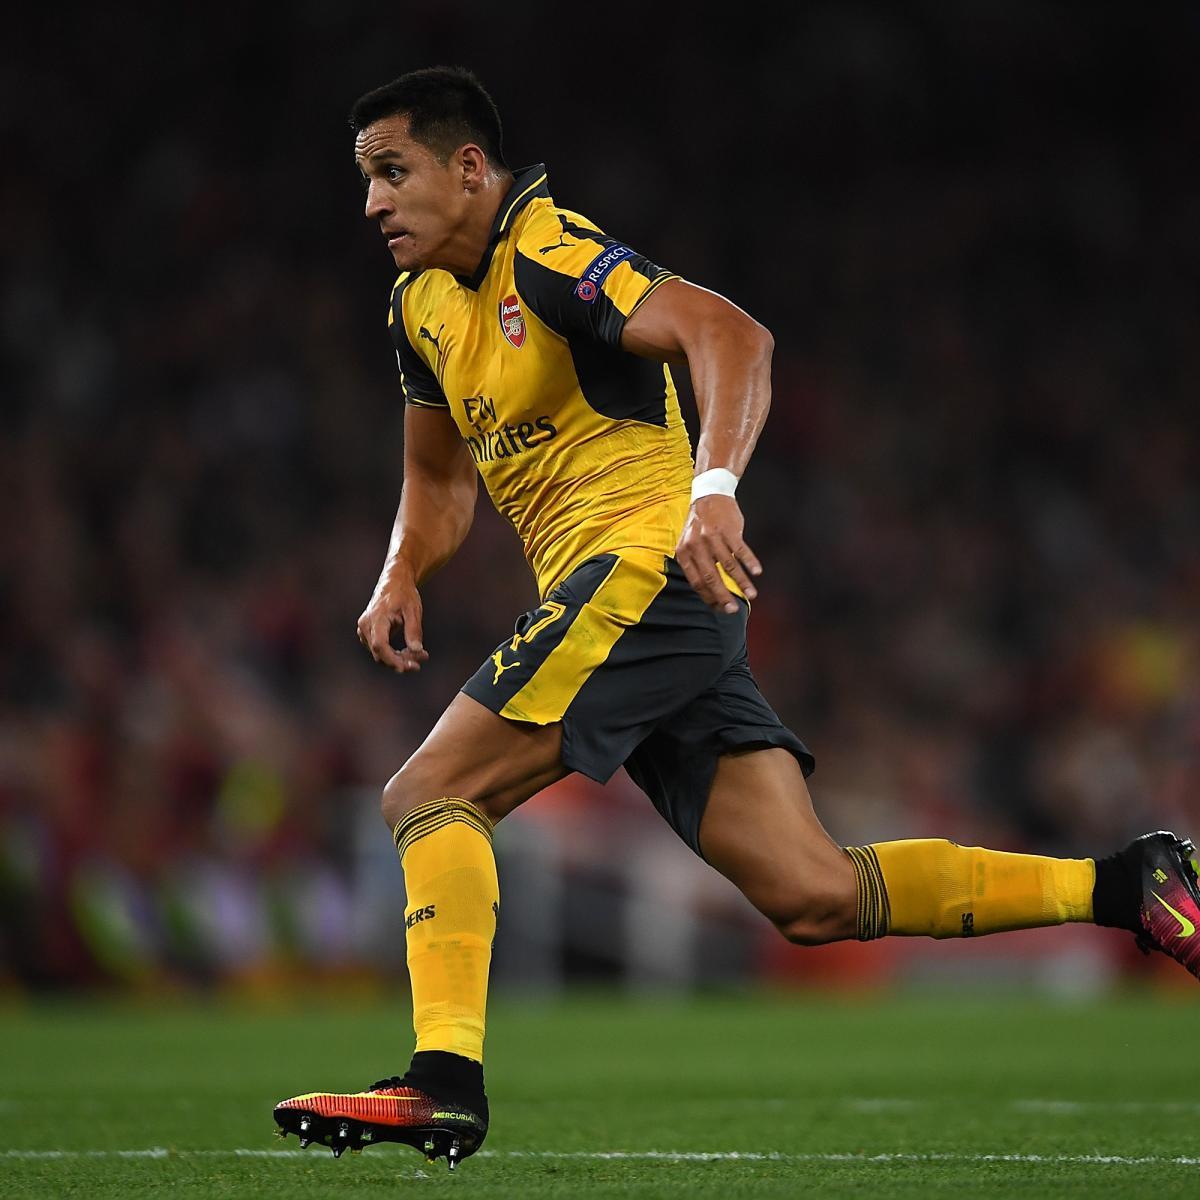 Arsenal Vs Barcelona Live Score Highlights From: Burnley Vs. Arsenal: Live Score, Highlights From Premier